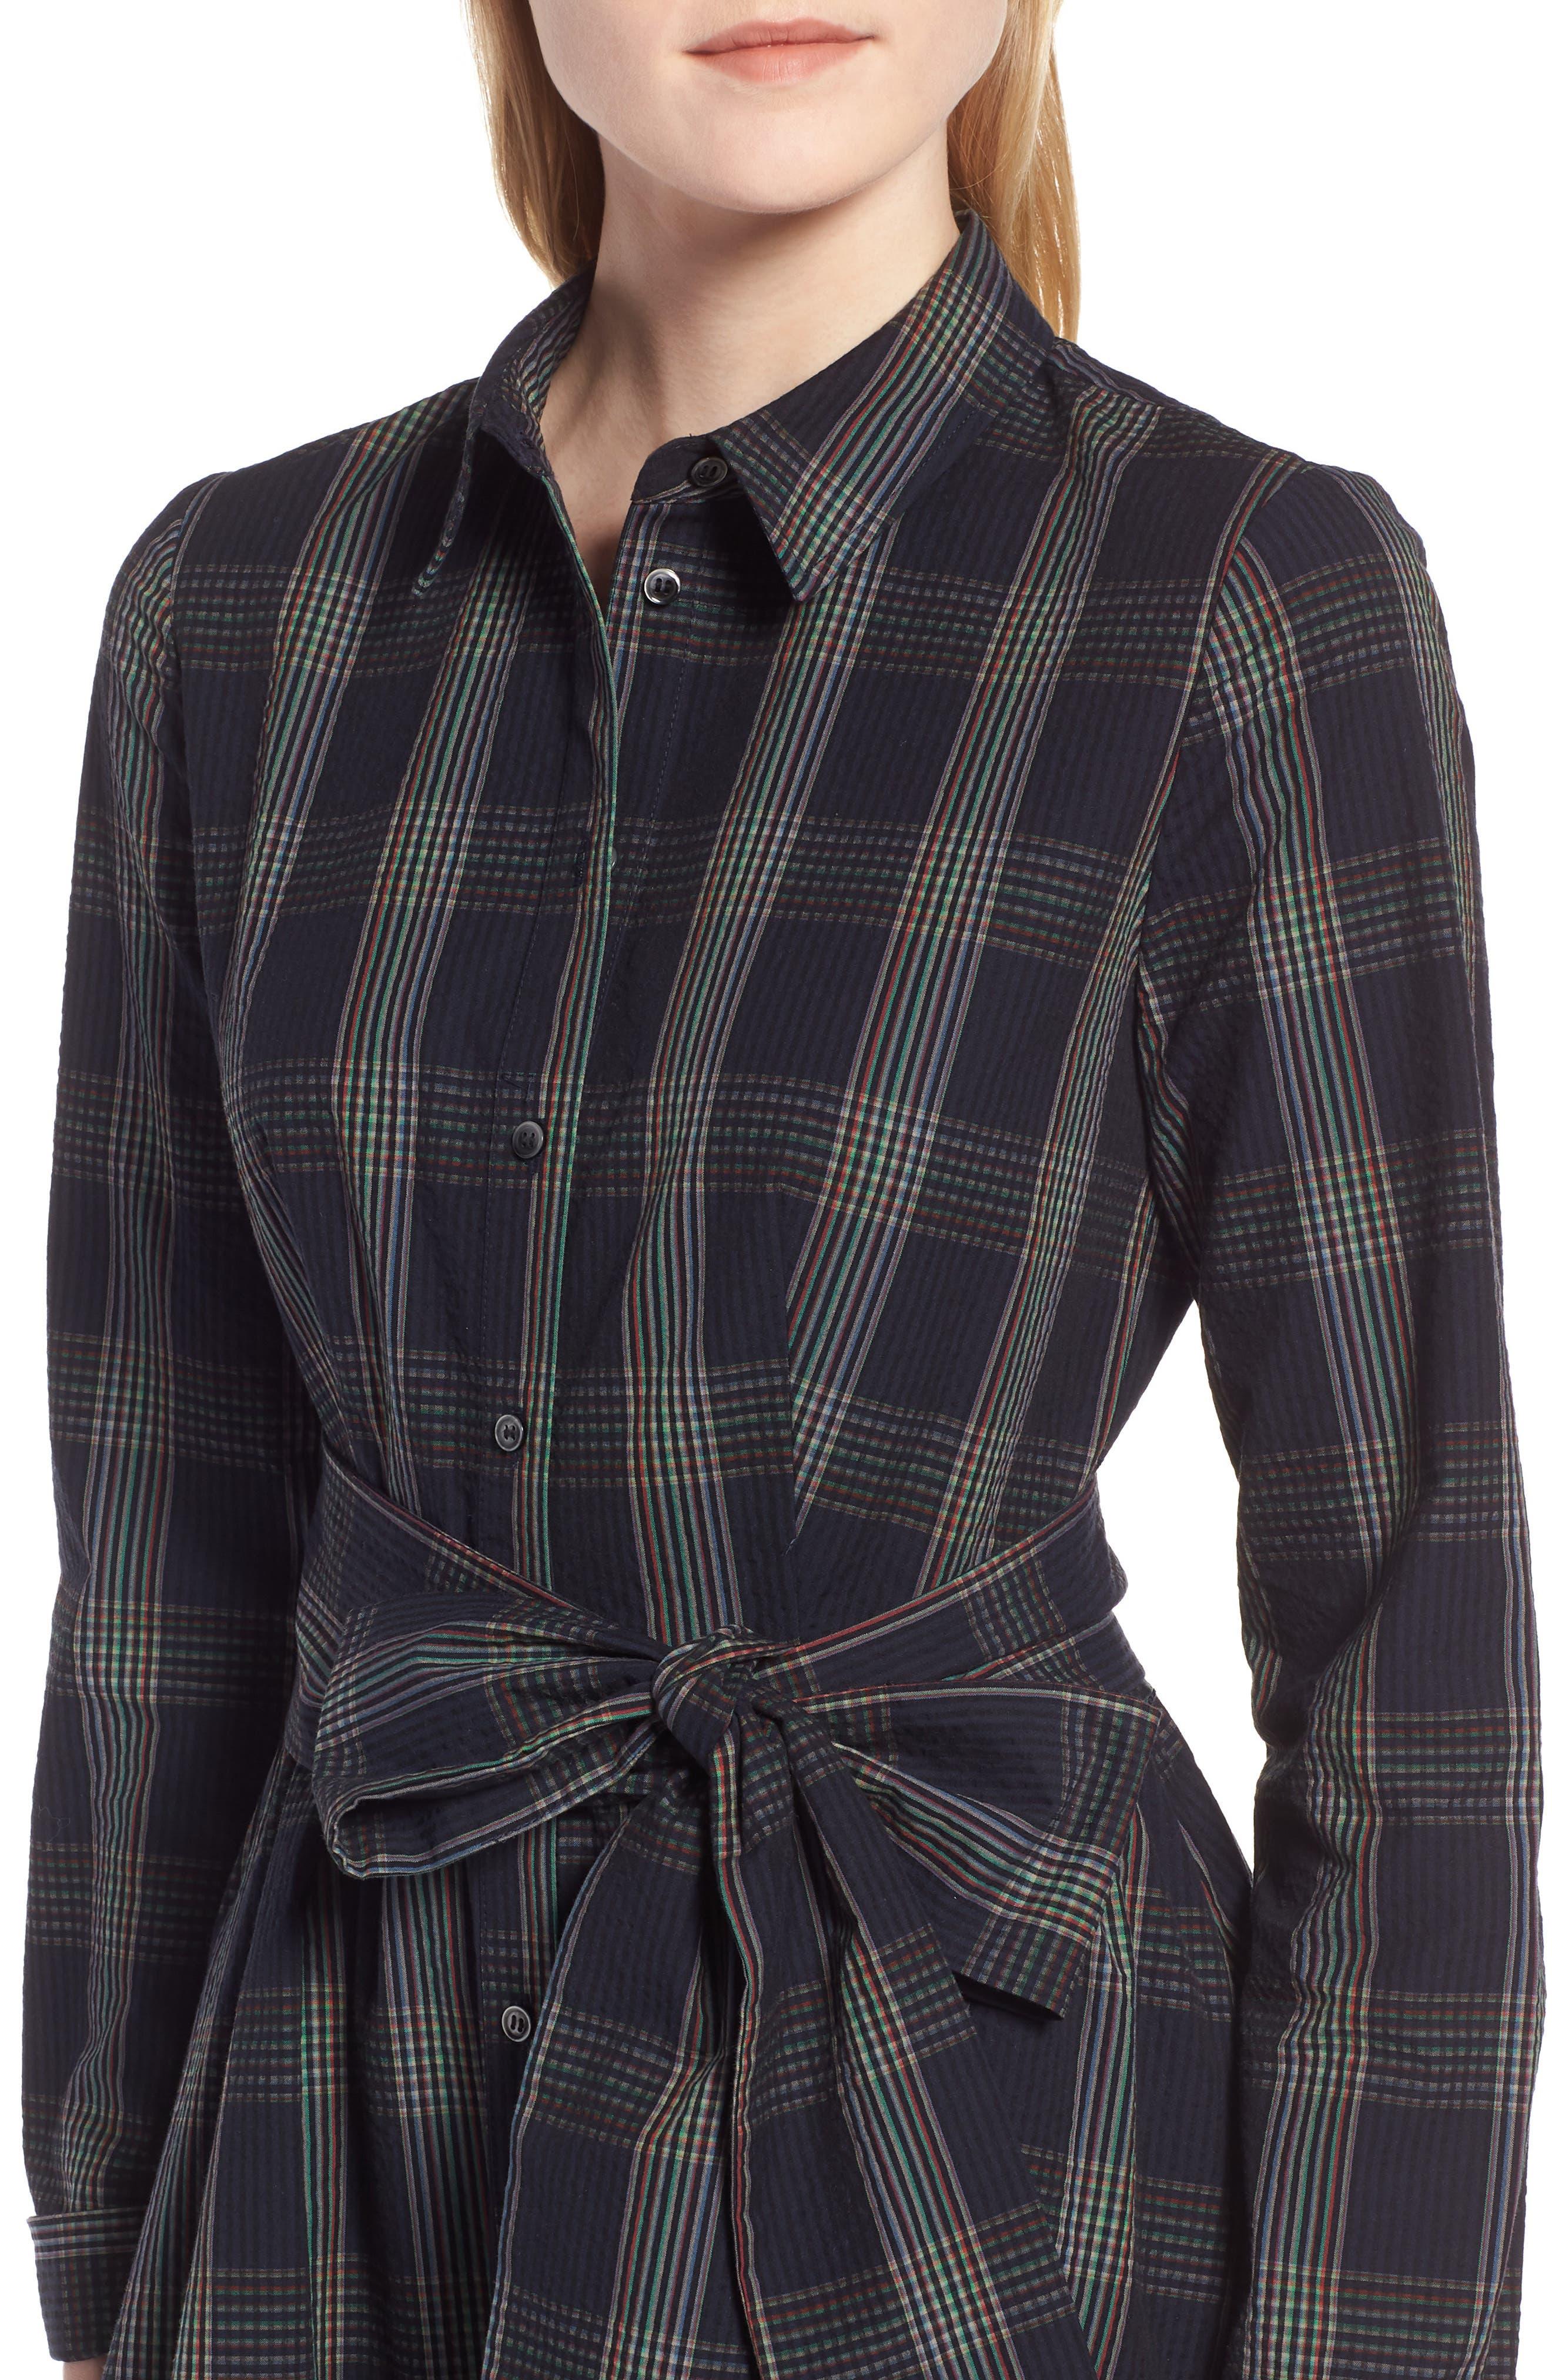 Plaid Midi Shirtdress,                             Alternate thumbnail 4, color,                             Navy Multi Plaid